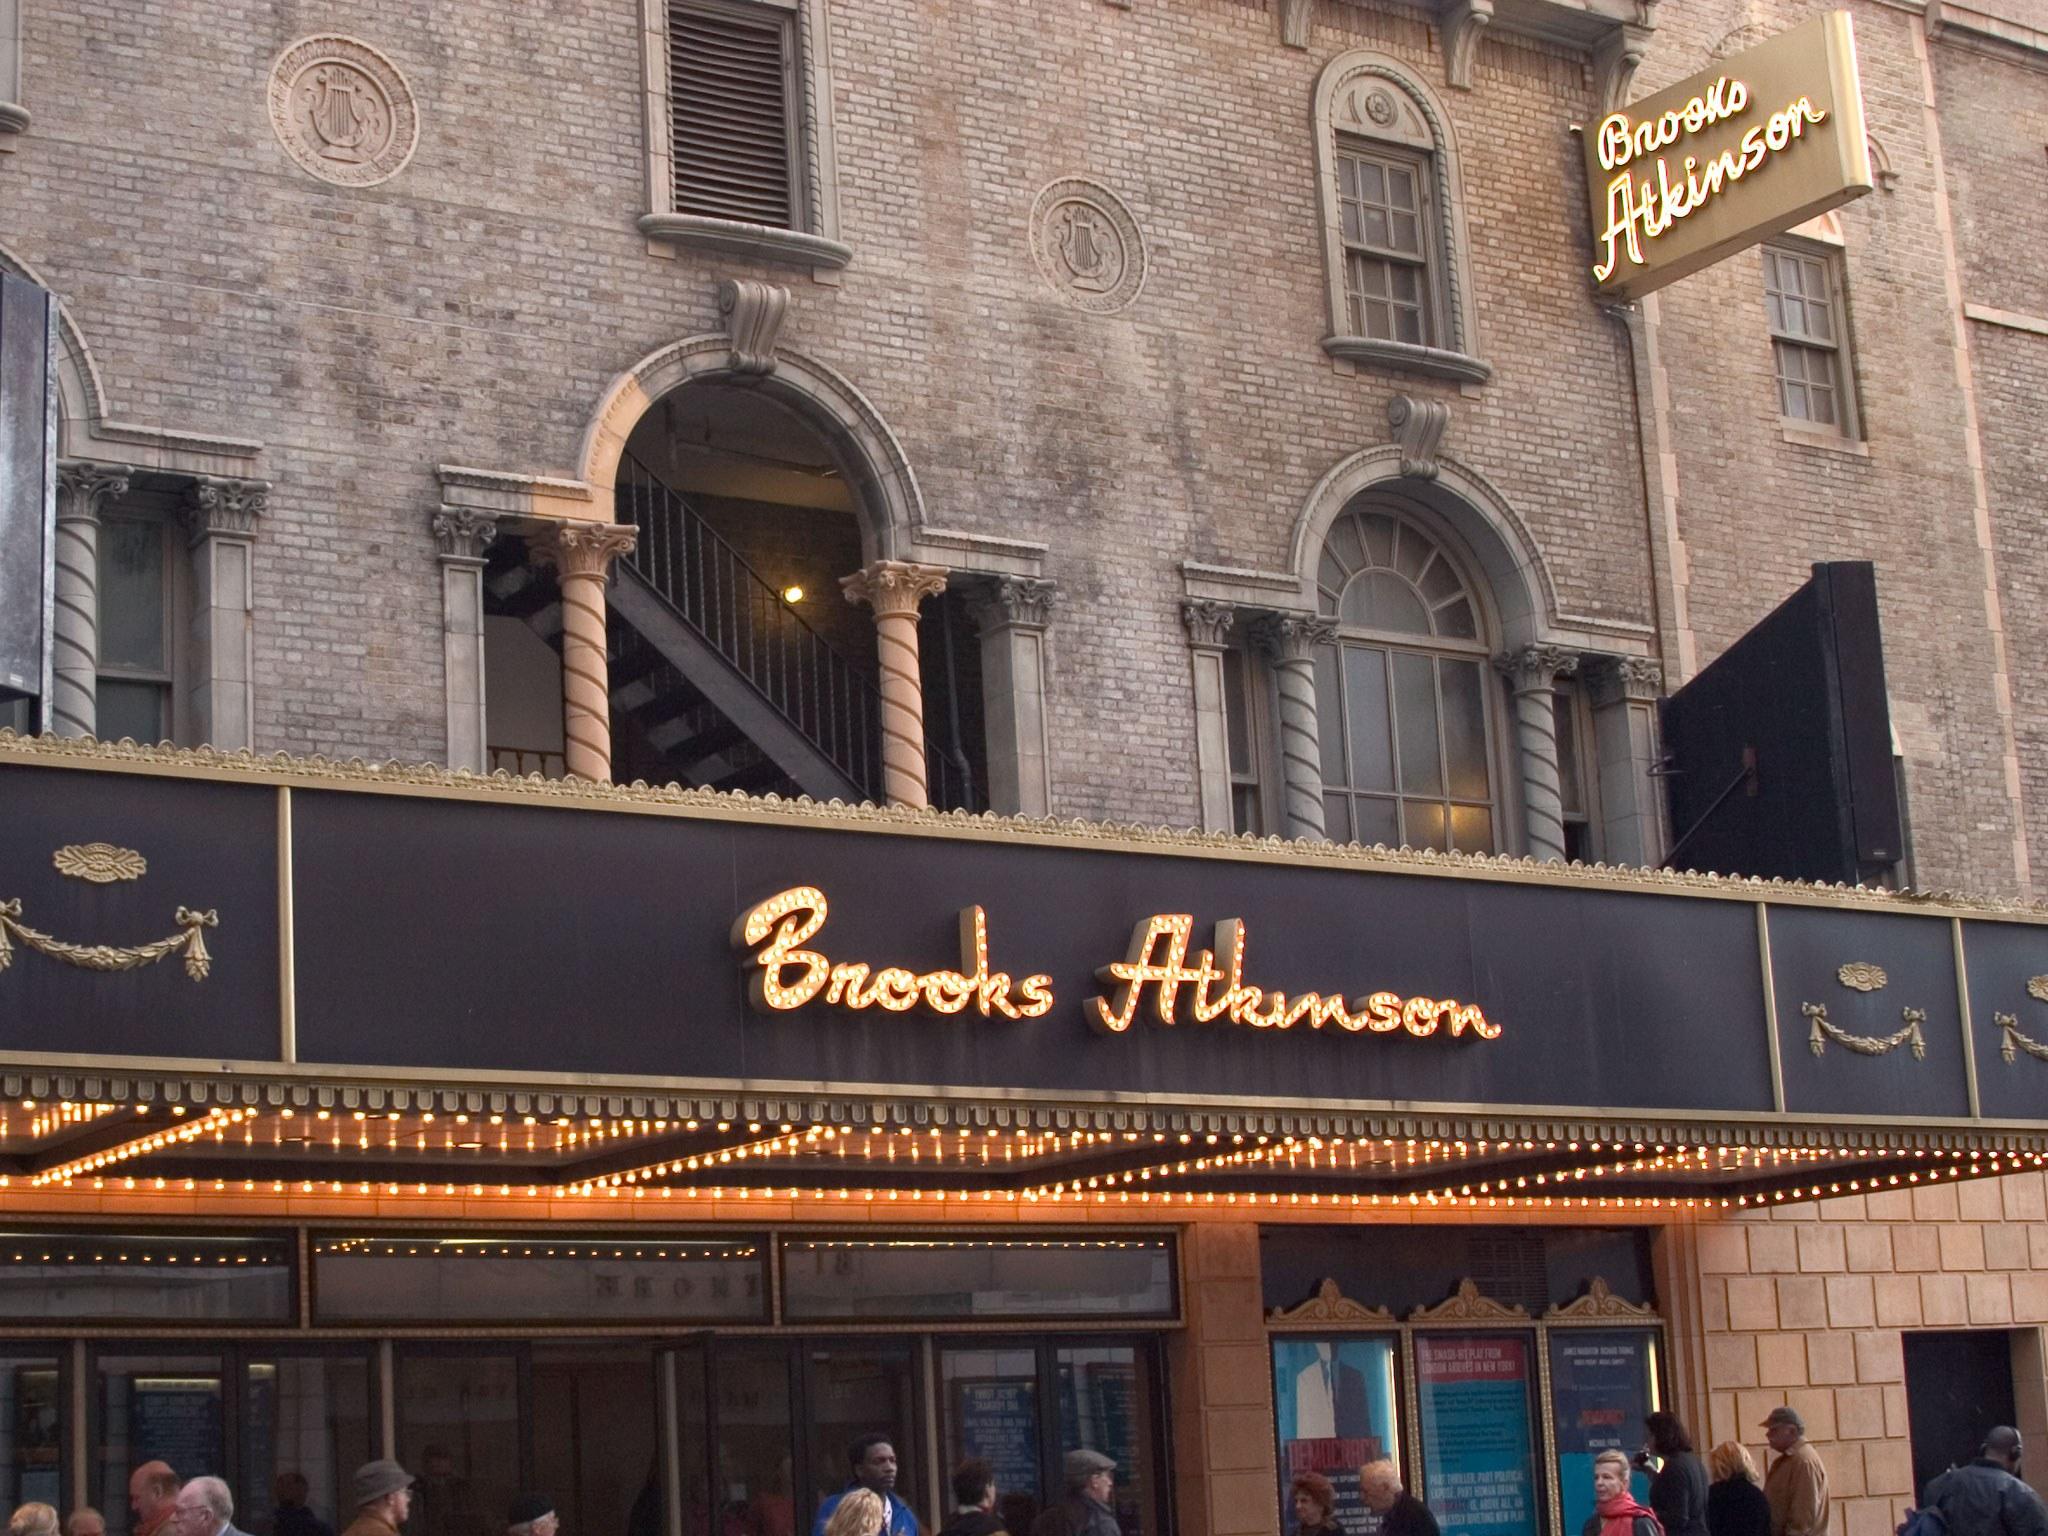 Brook Atkinson Broadway Theatre